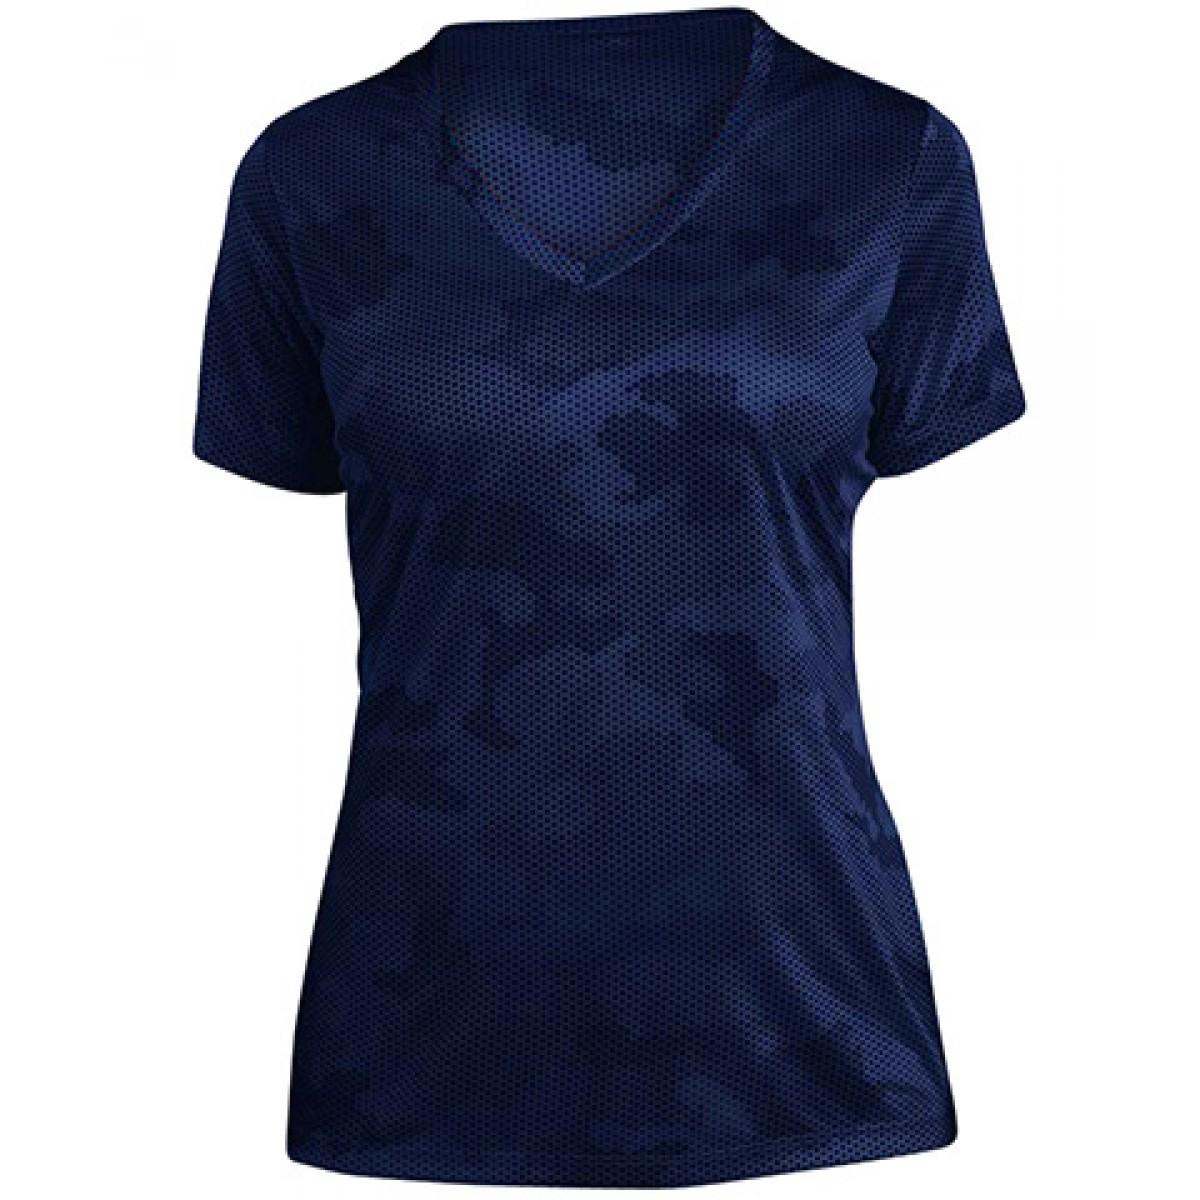 Ladies CamoHex V-Neck Tee-Royal Blue-3XL